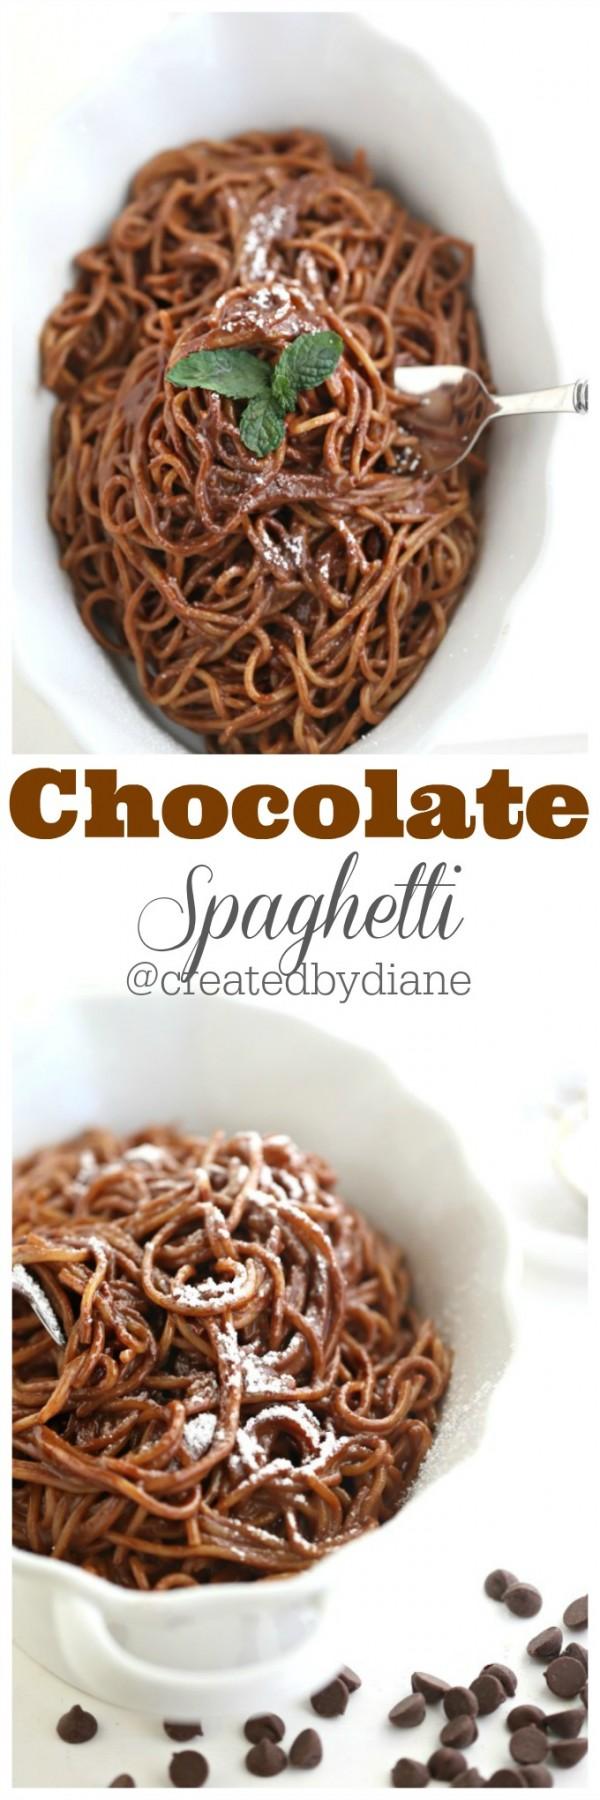 Get the recipe Chocolate Spaghetti @recipes_to_go